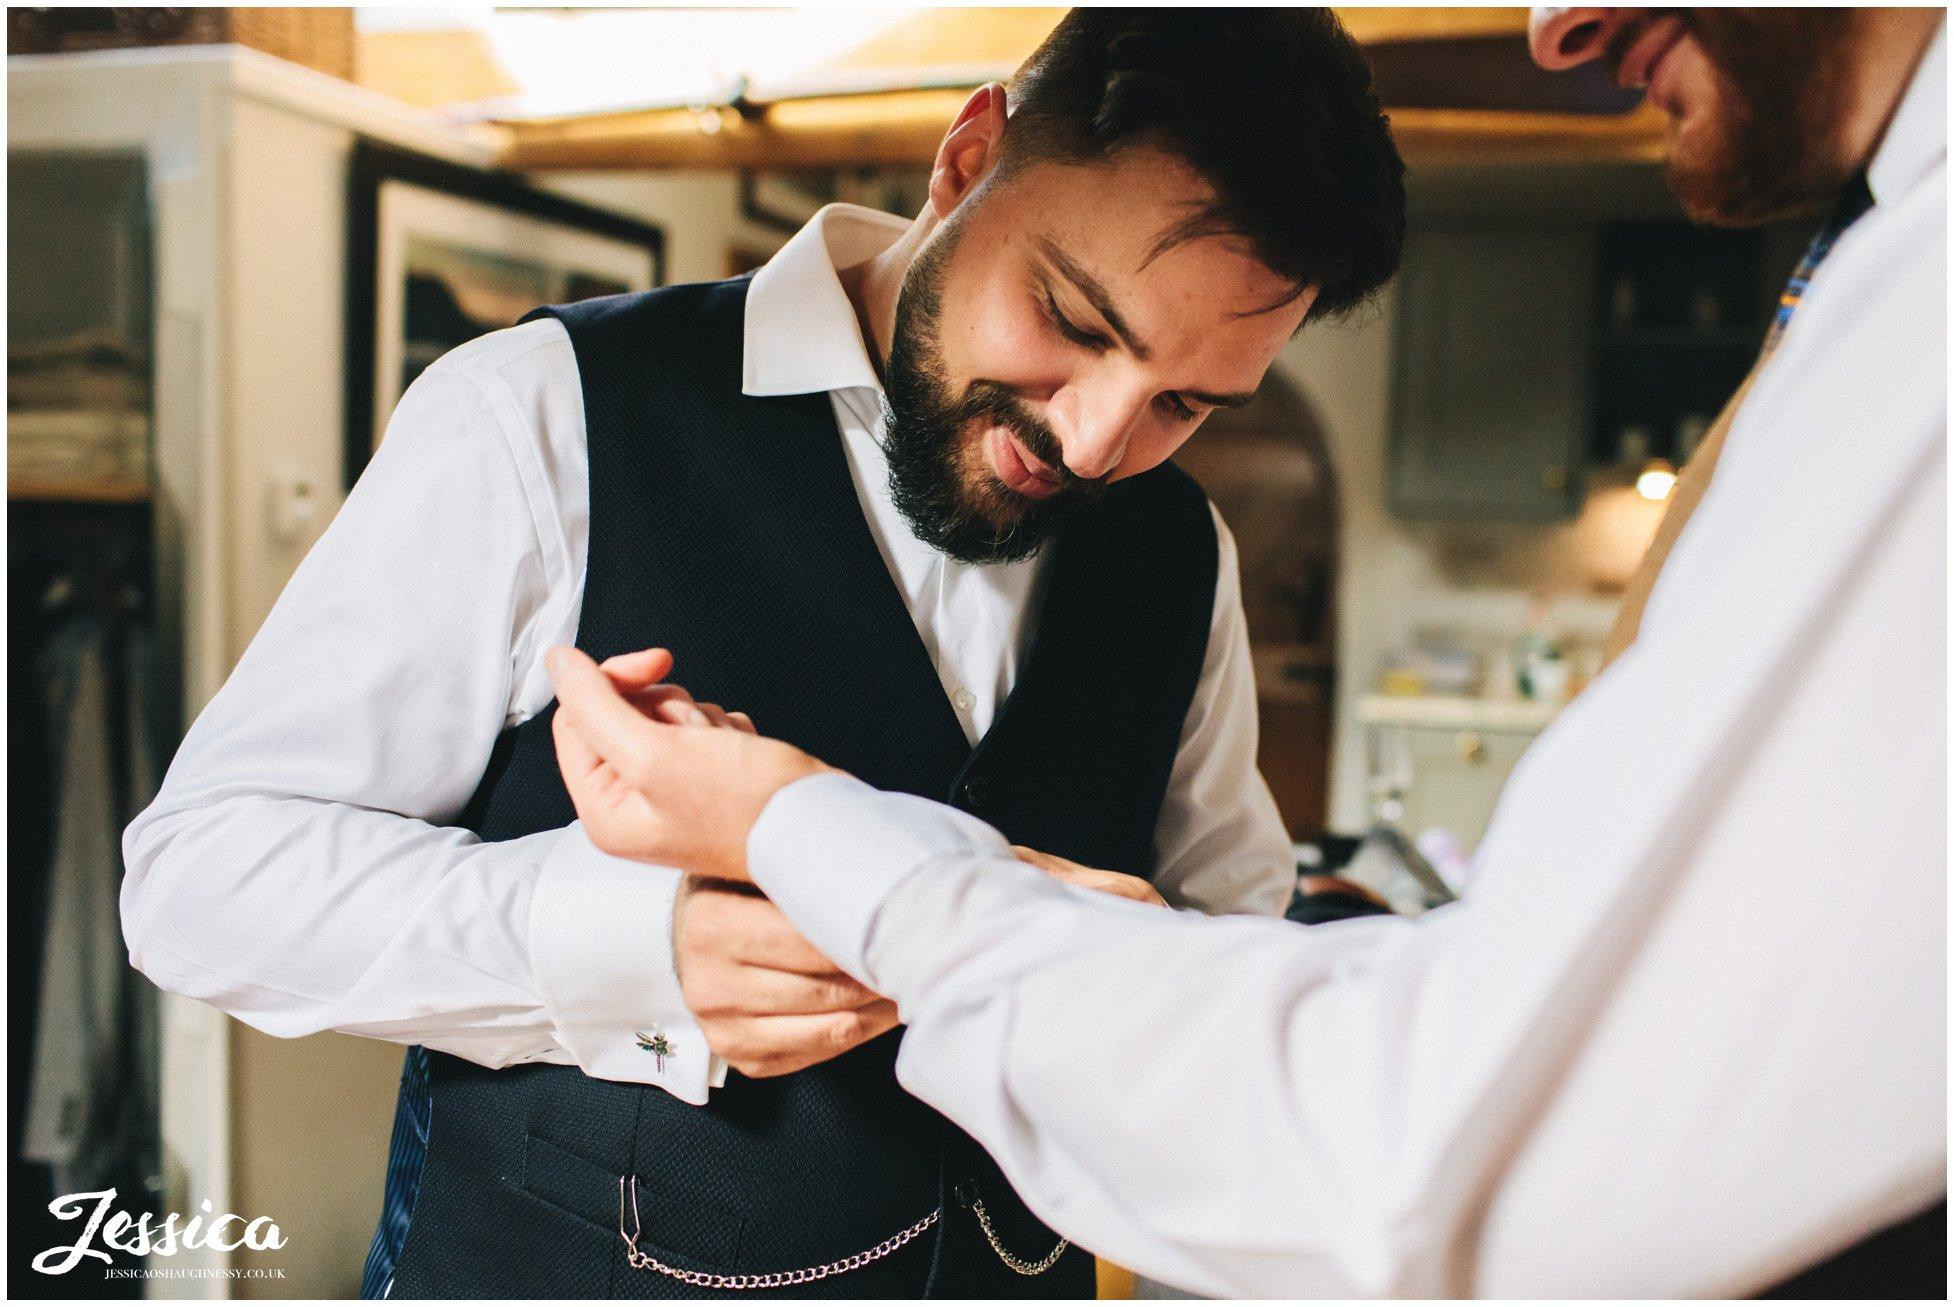 Groom fastens his fiance's cufflinks